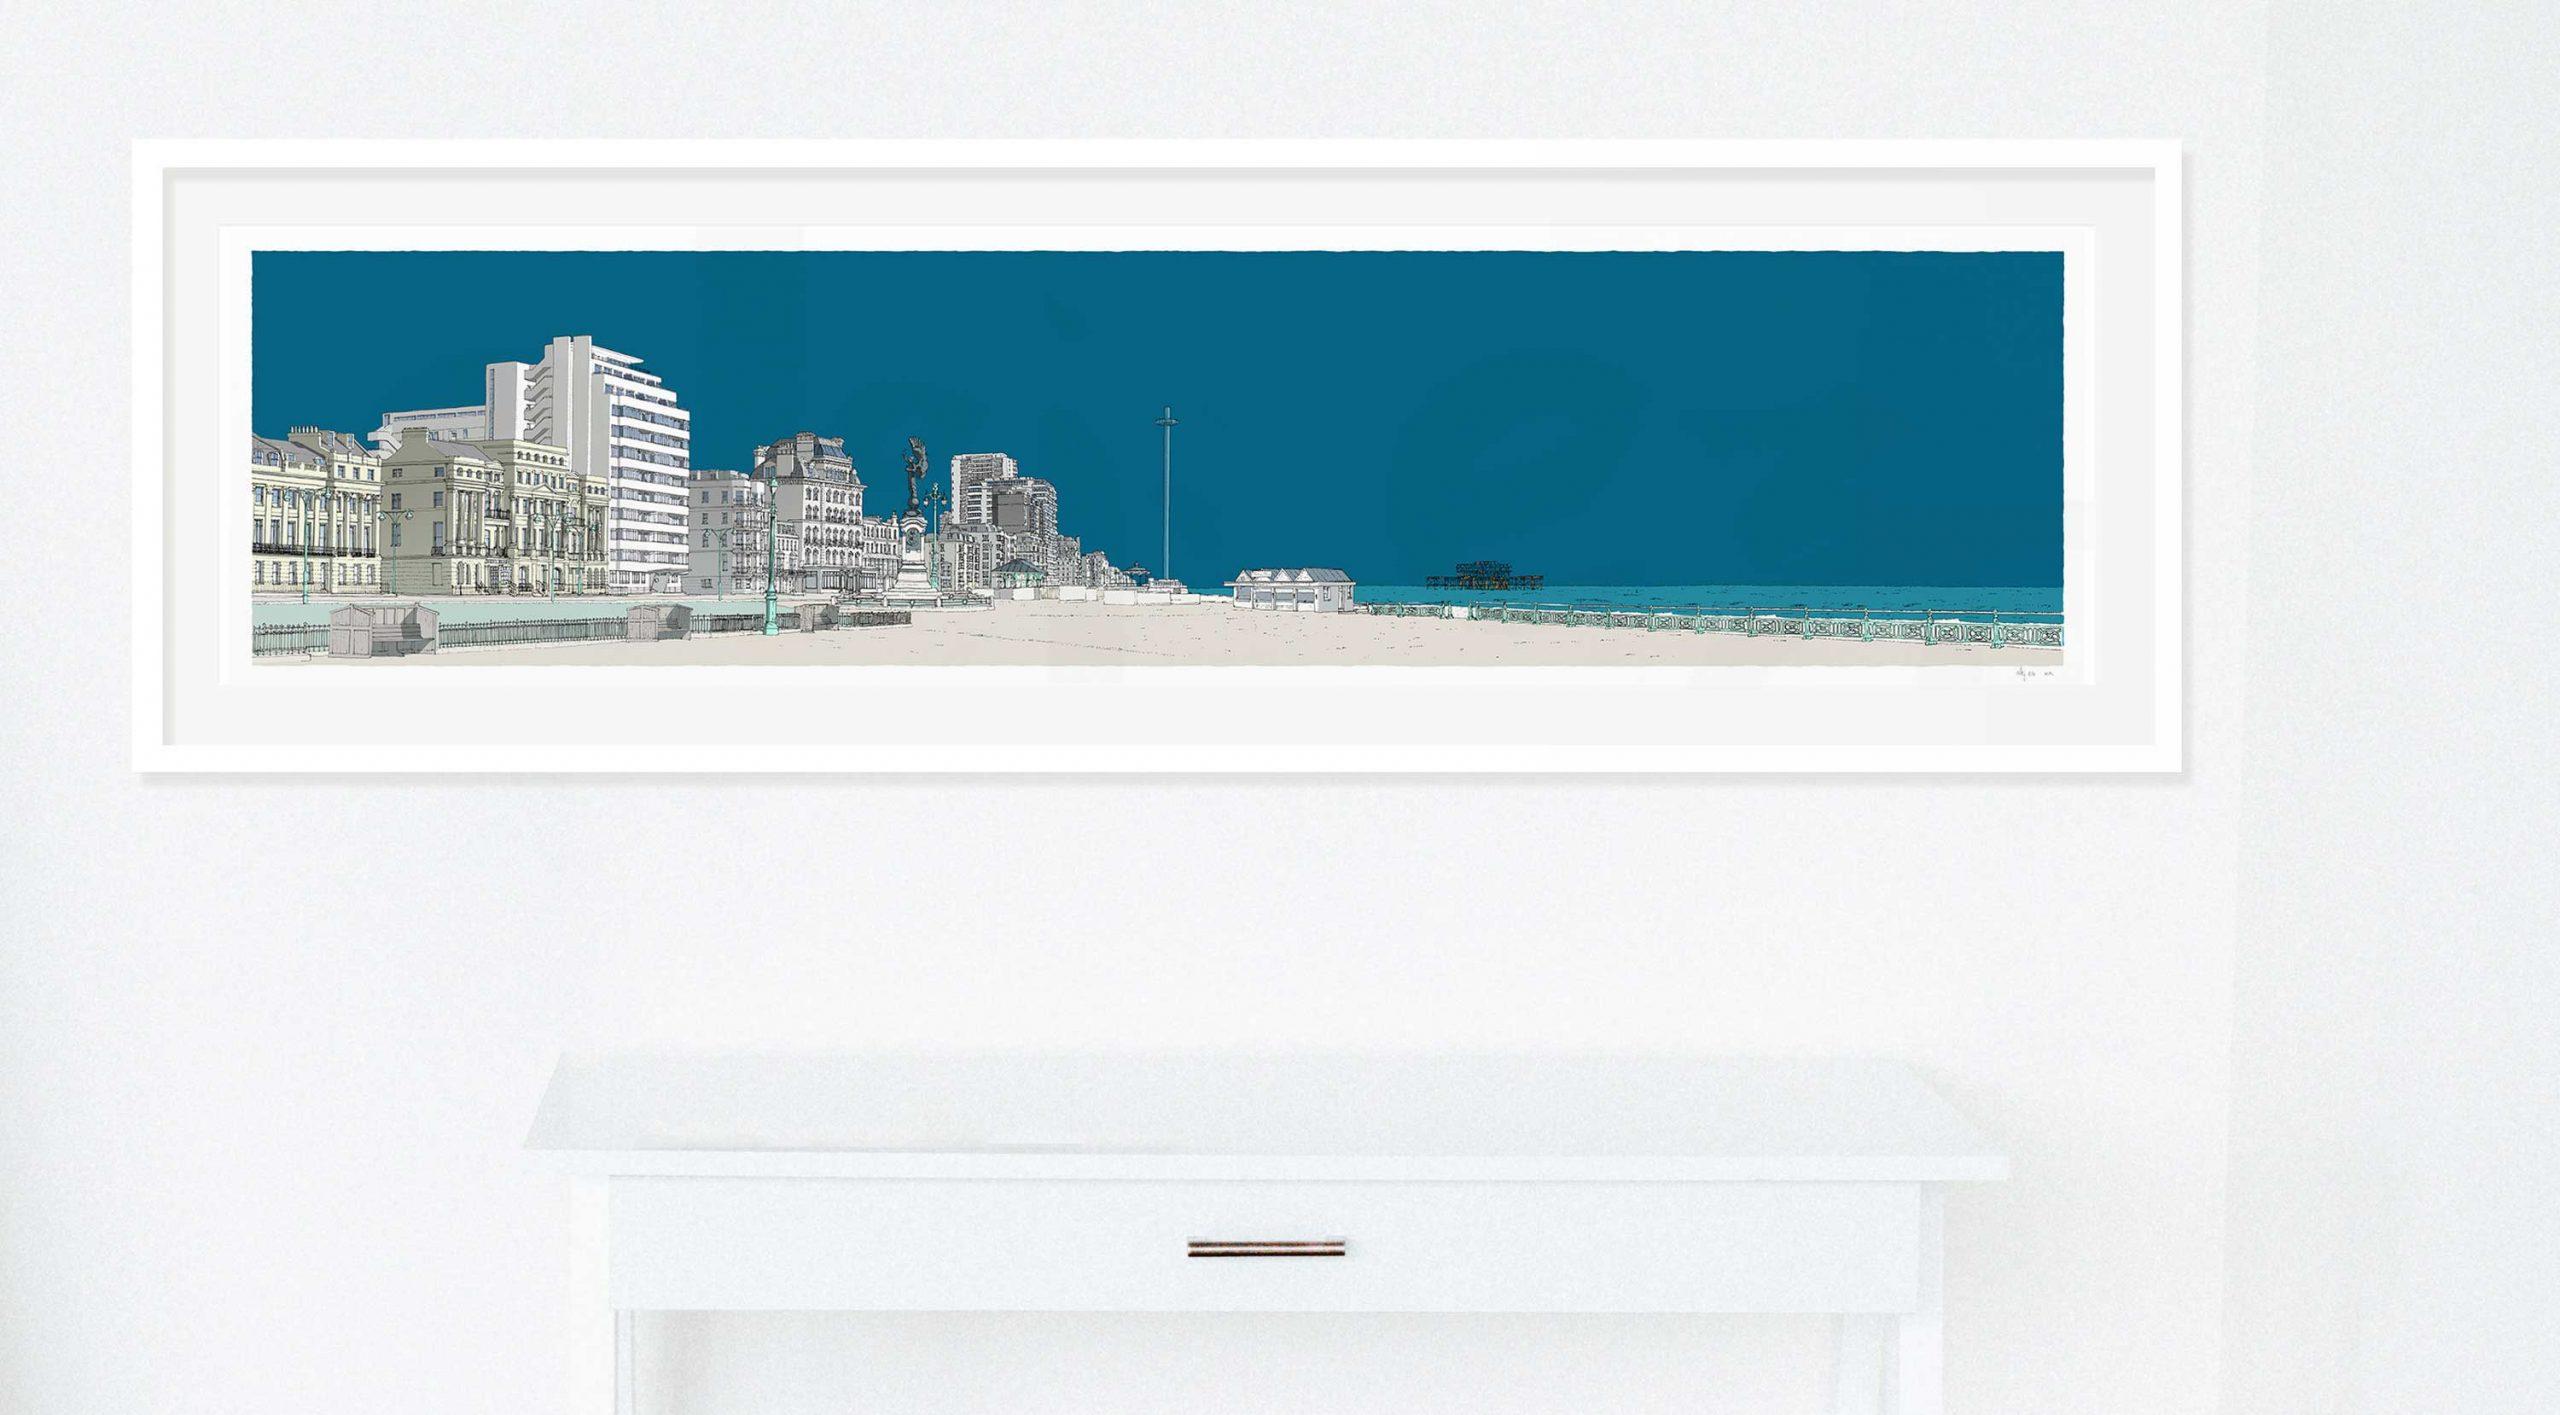 framed fine art print by artist alej ez named Embassy Court Brighton and Hove Promenade Ocean Blue